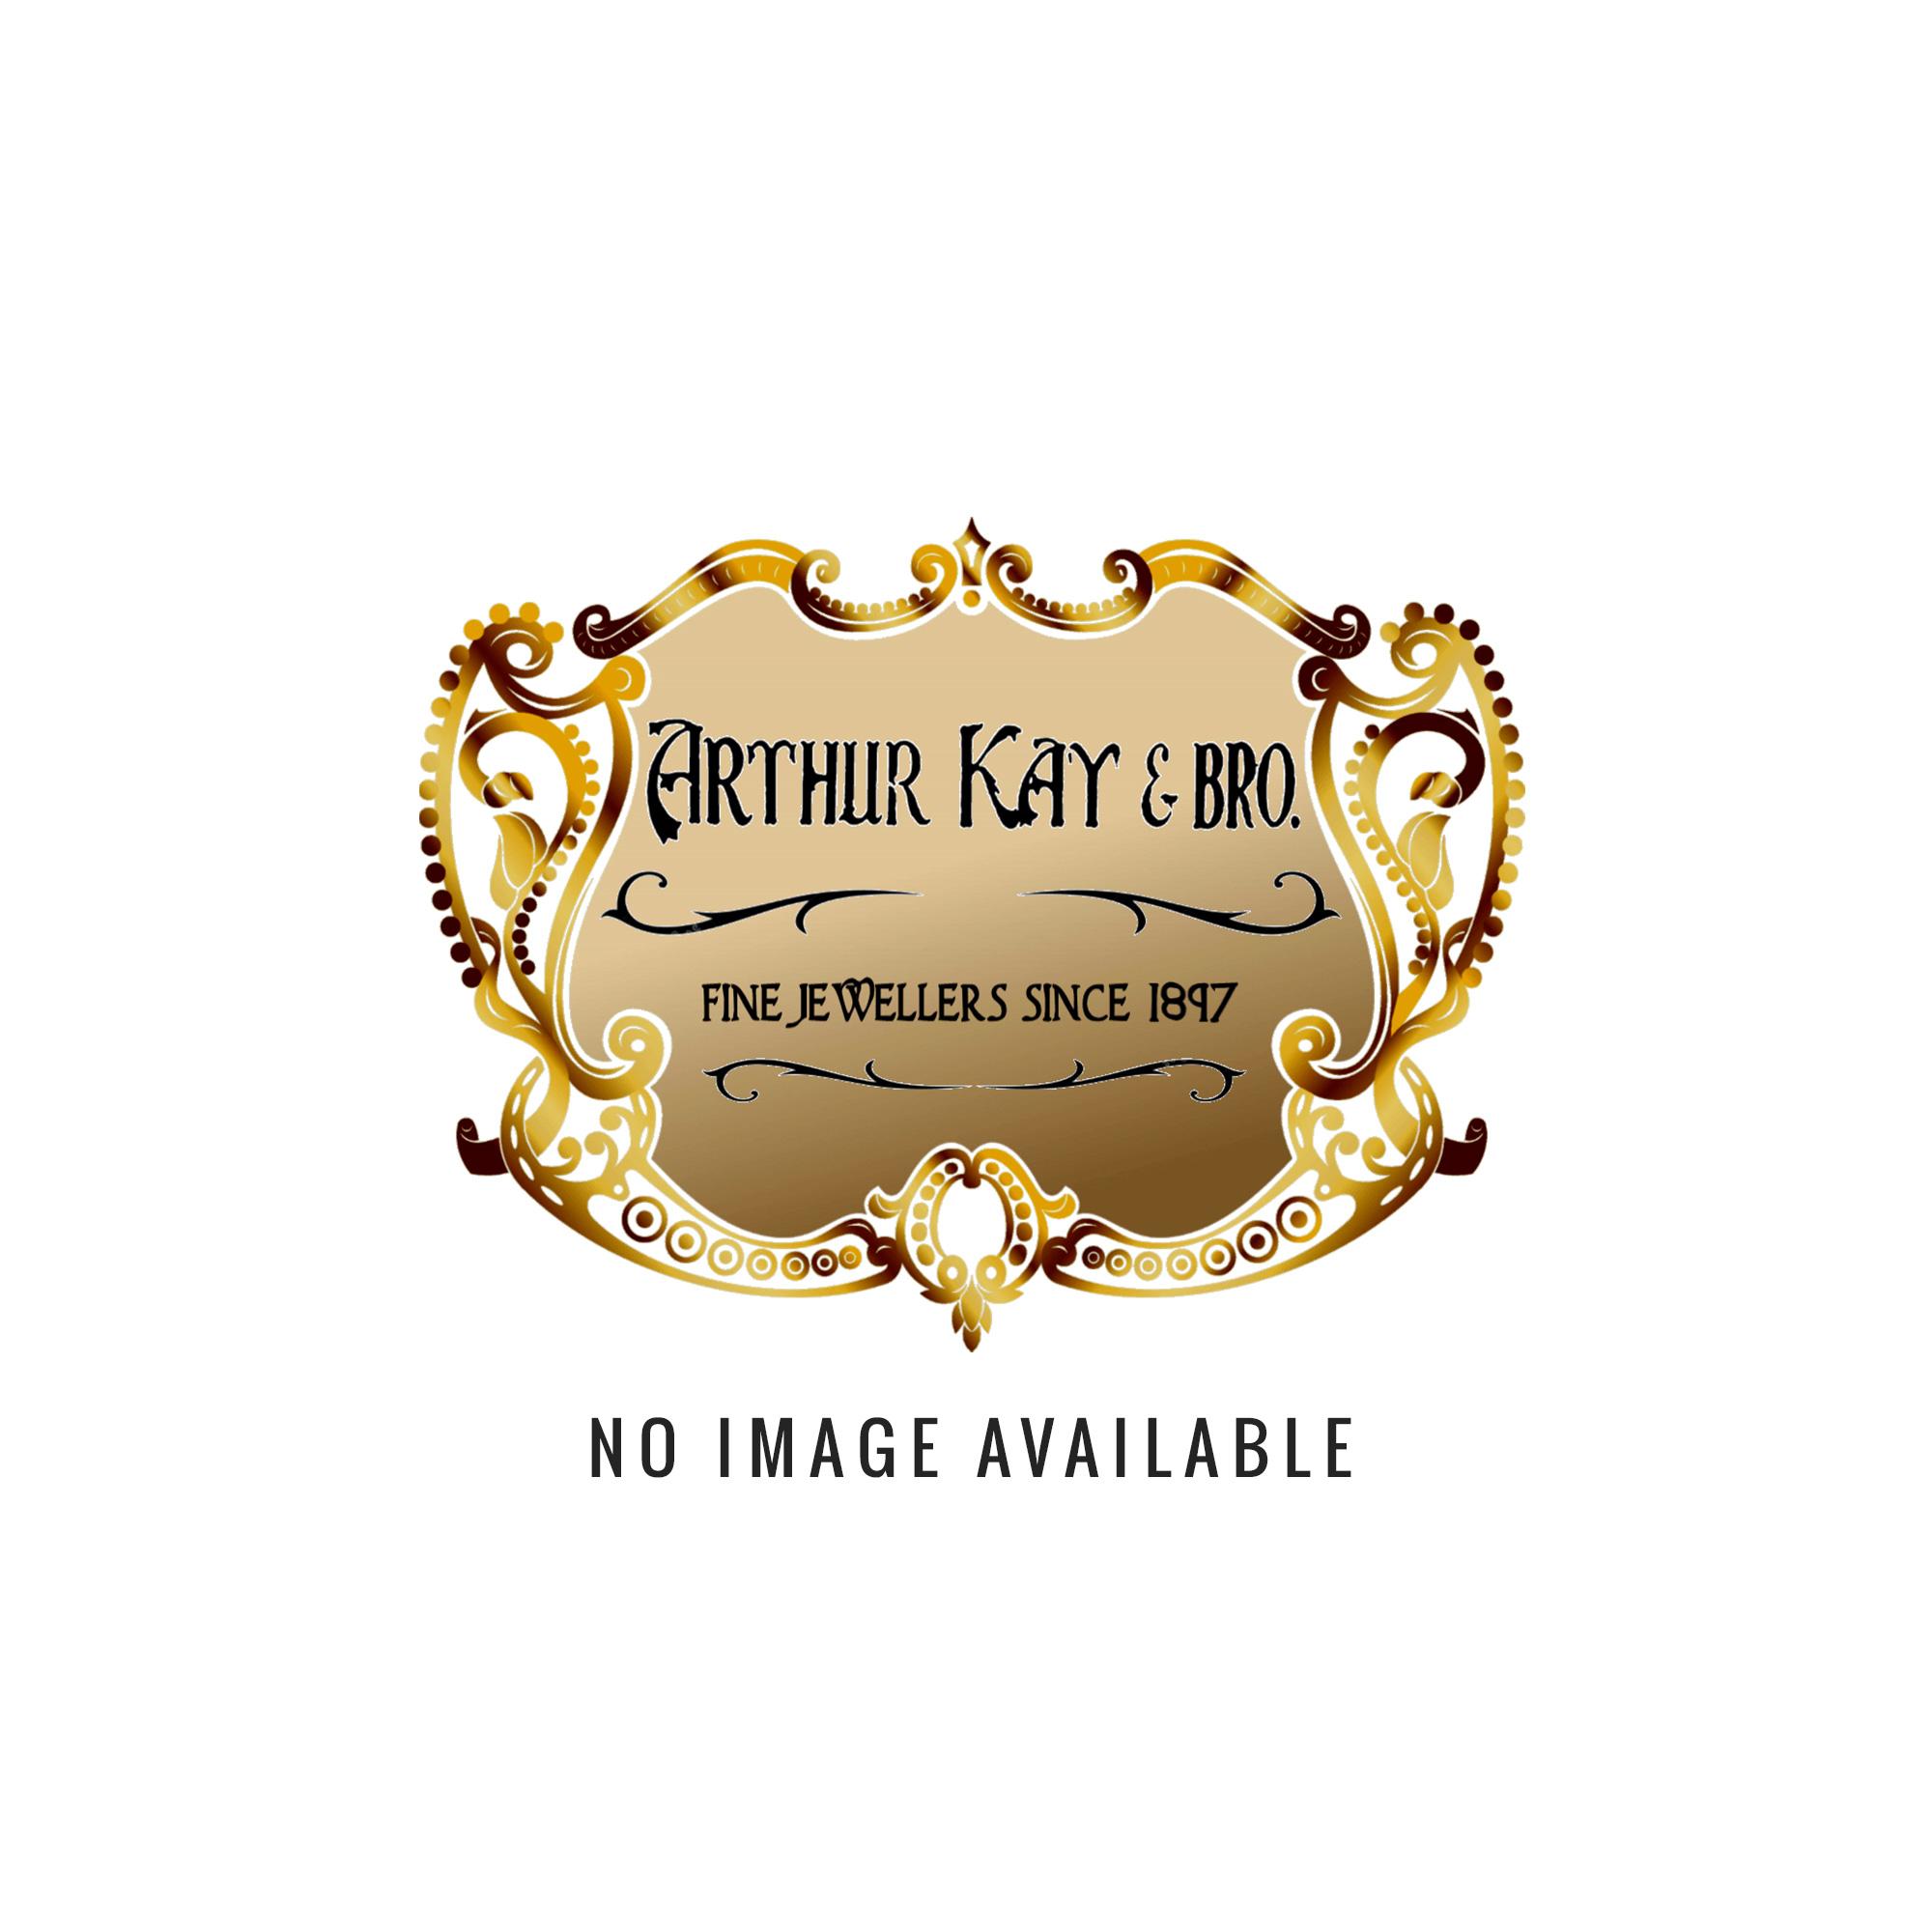 Buy gold quartz watch shop every store on the internet via pricepi united kingdom for Internet 28717